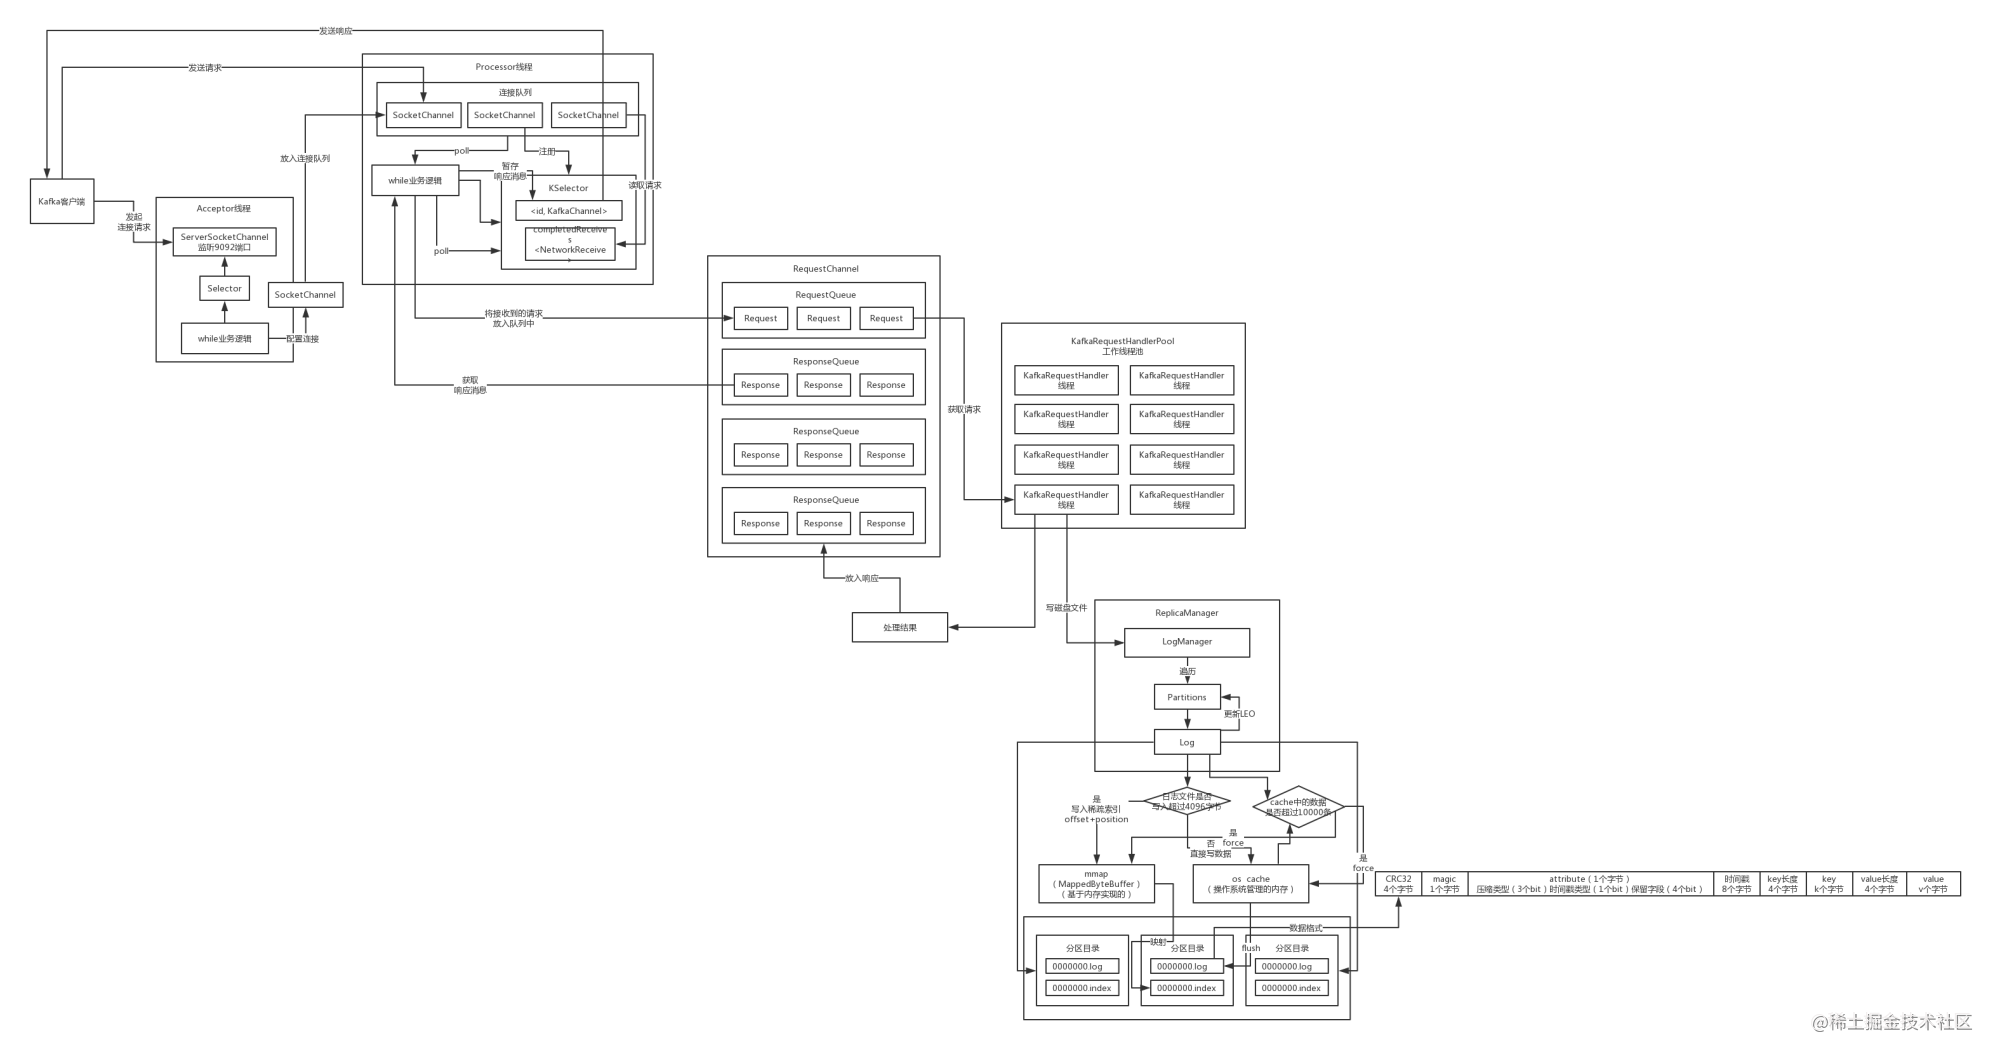 05_Kafka服务器的源码剖析 (17).jpg